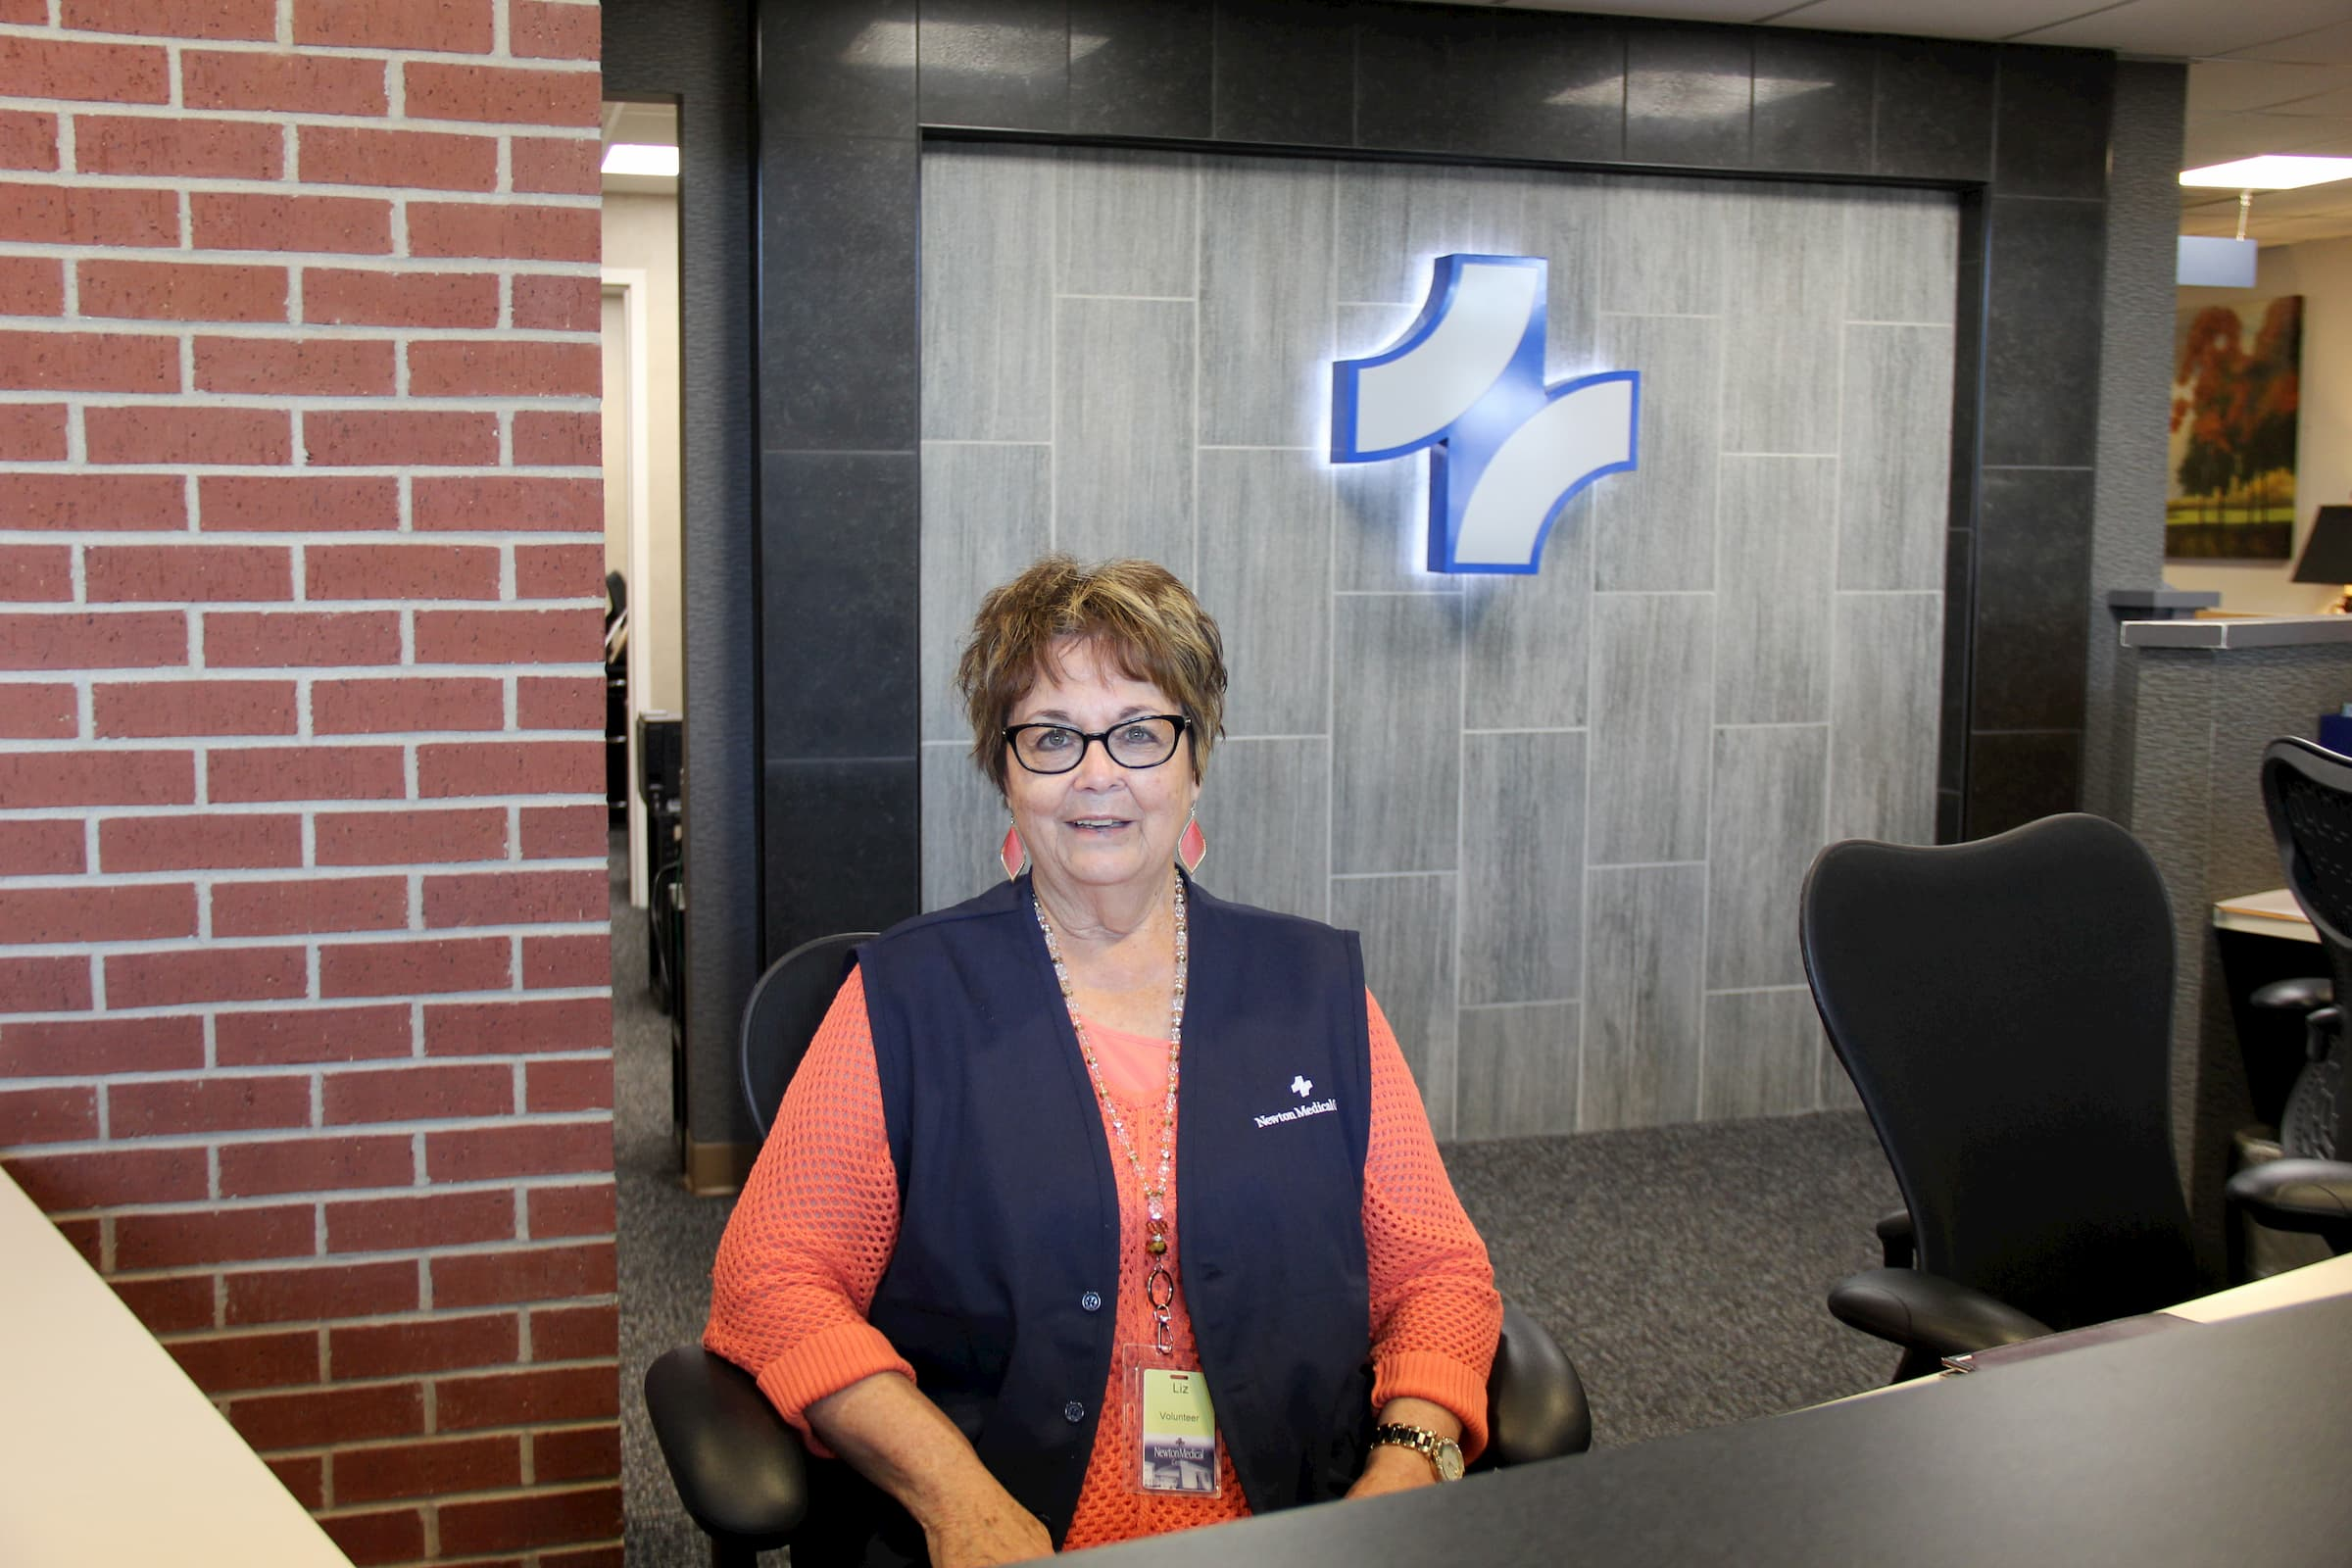 white female volunteer in blue vest sitting at desk